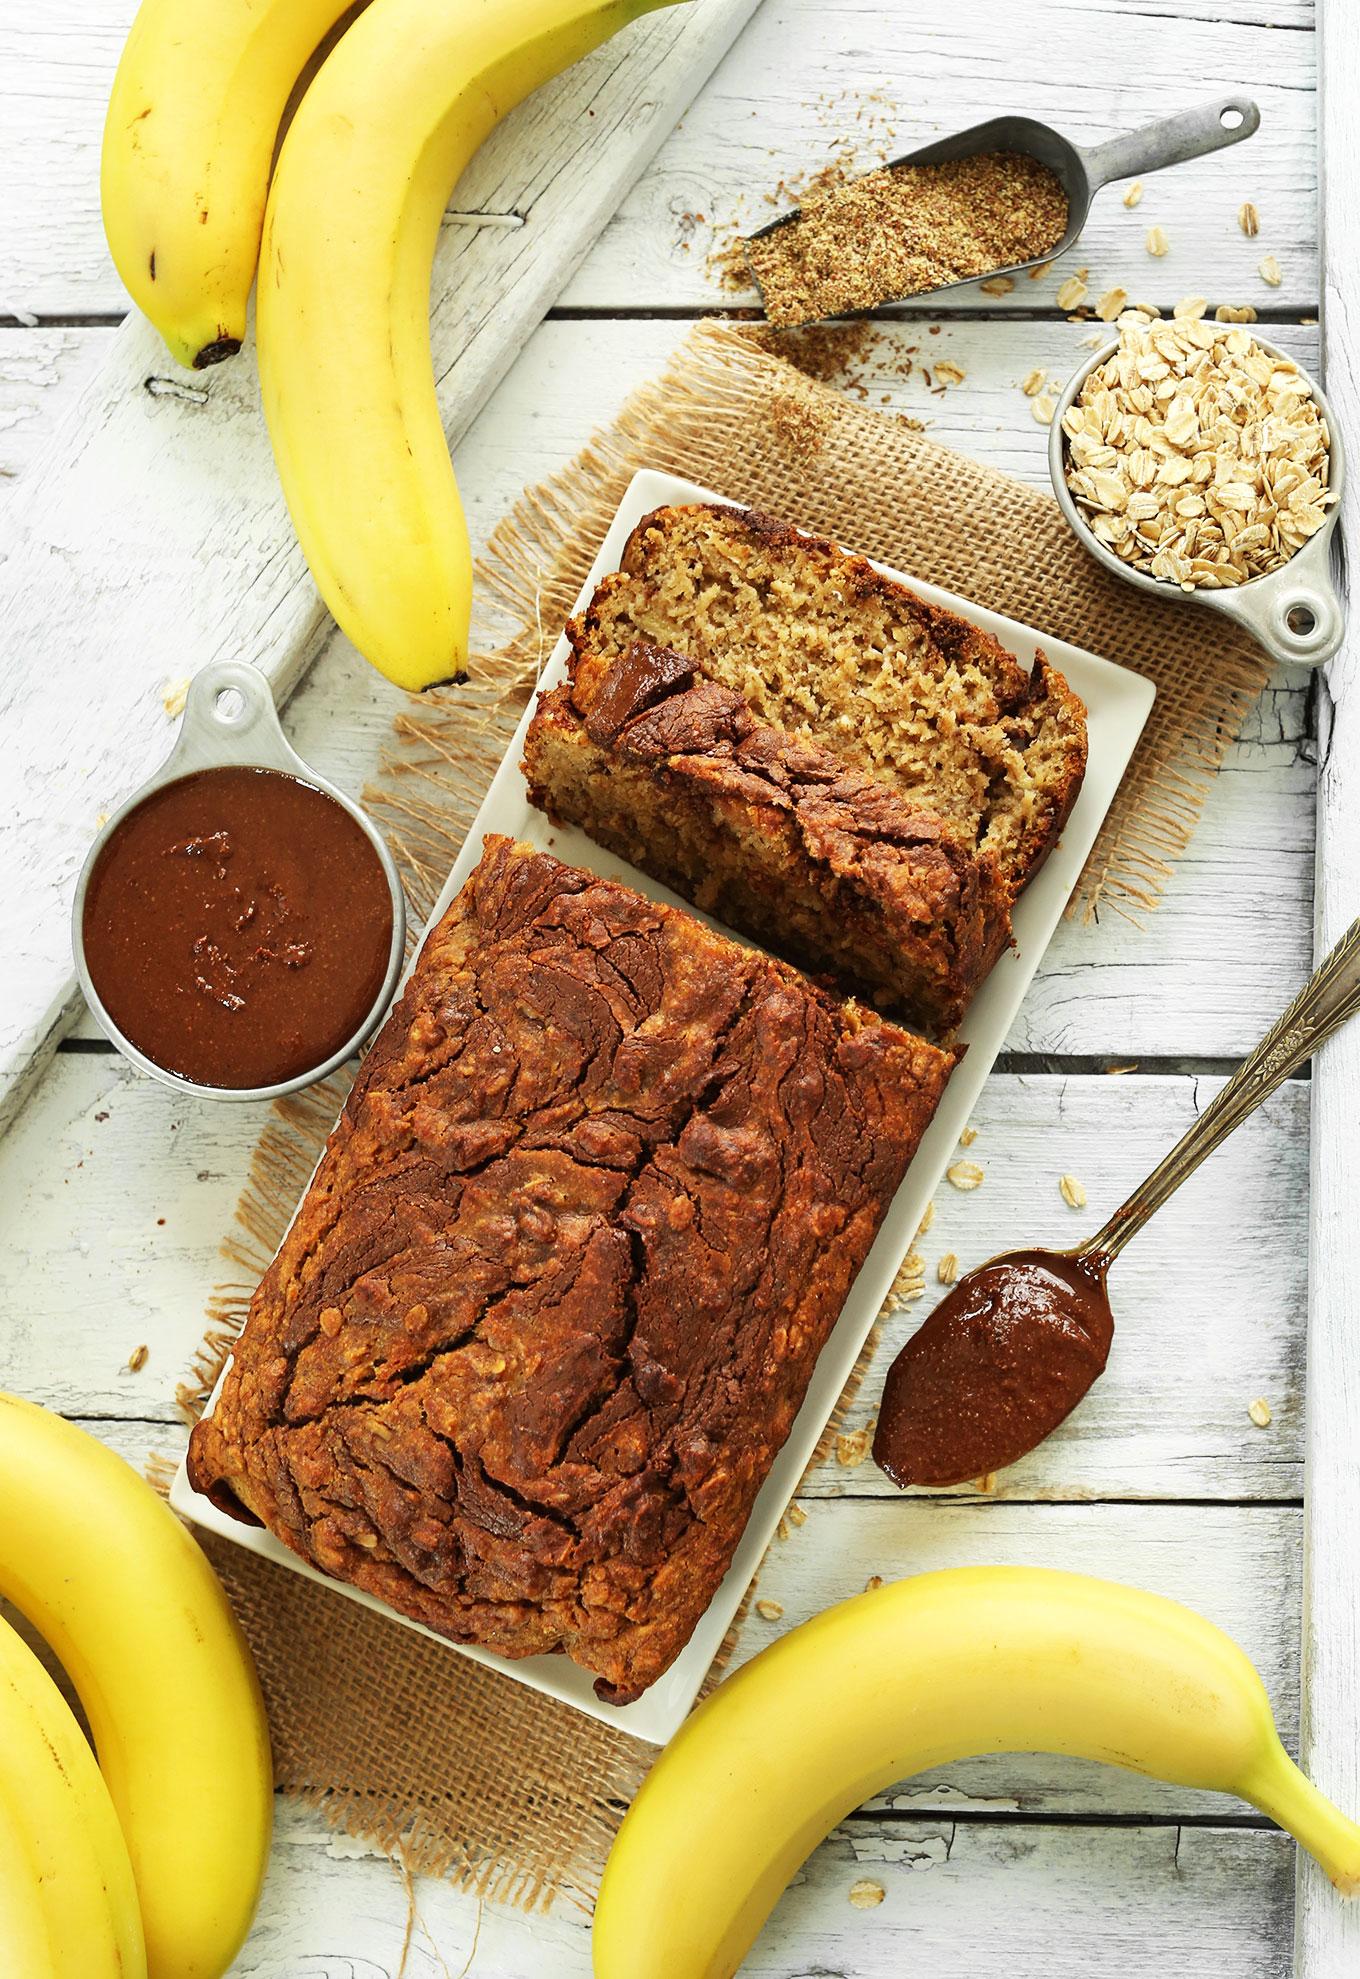 AMAZING Tender Chocolatey NUTELLA Banana Bread! #vegan #glutenfree #minimalistbaker